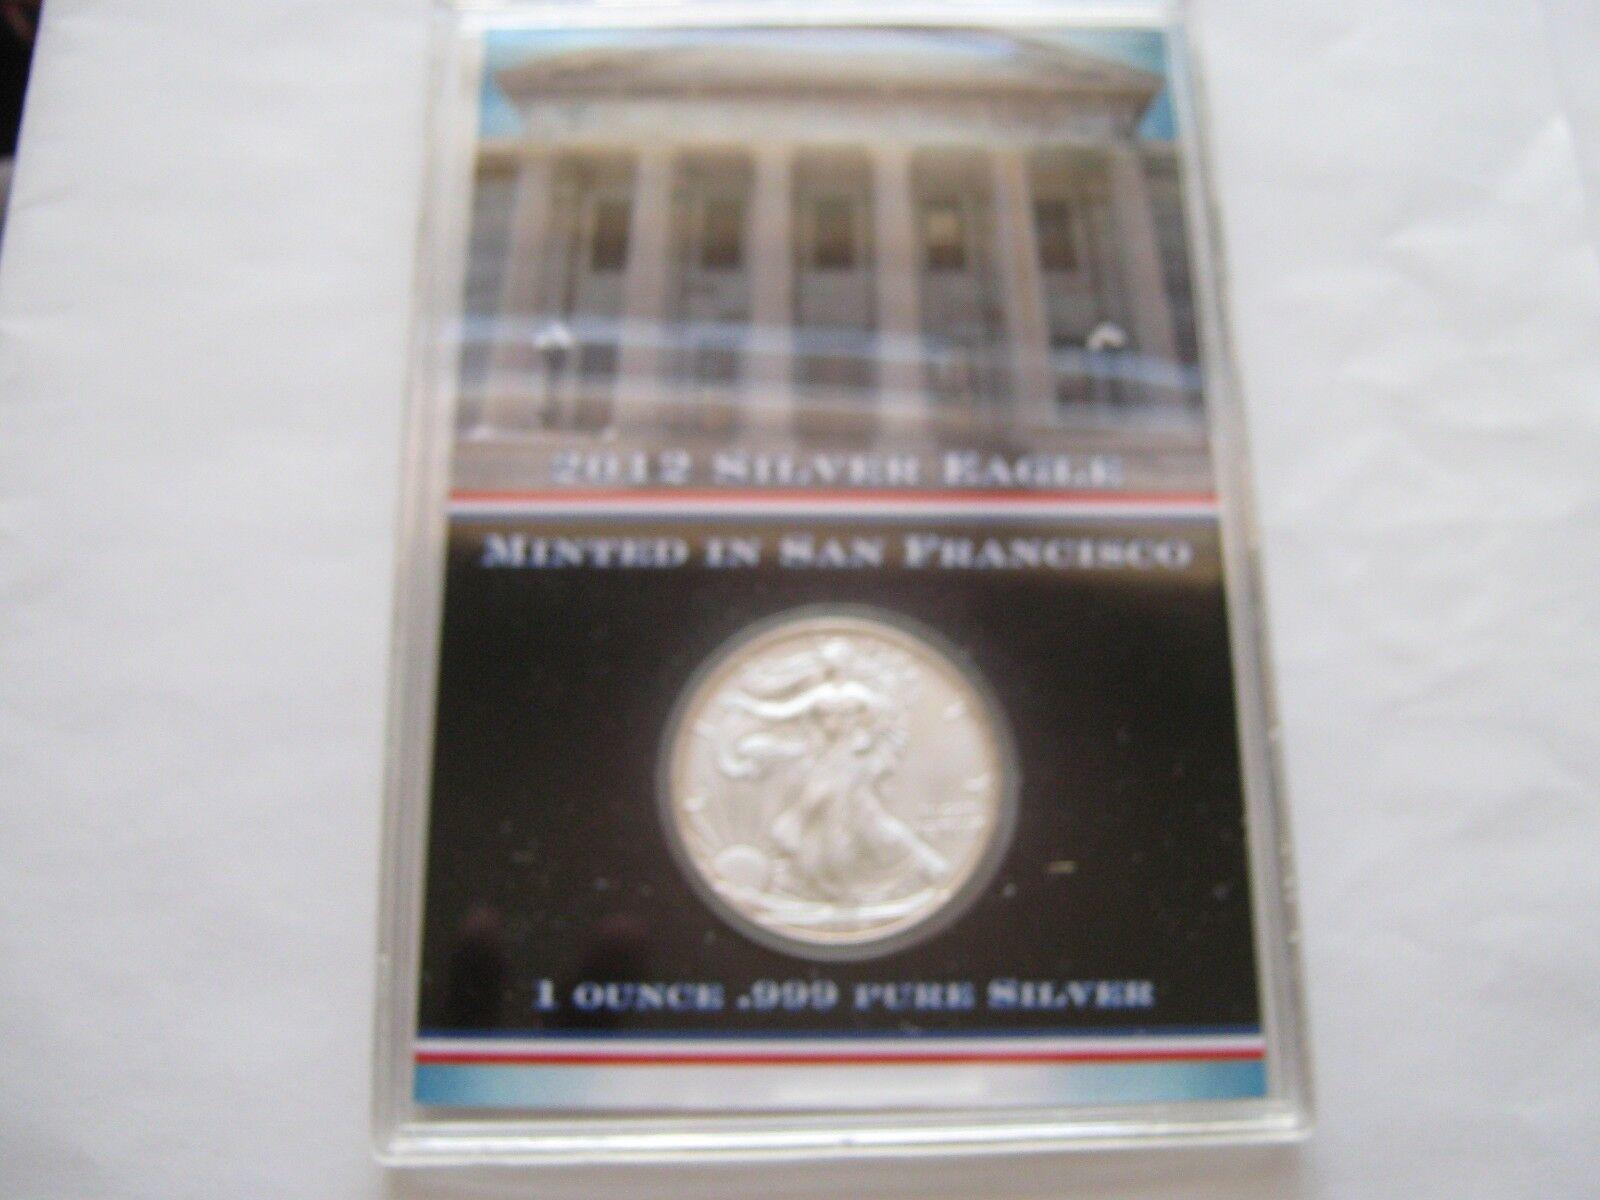 2012 Silver Eagle , Struck at San Francisco Mint , 5 Co